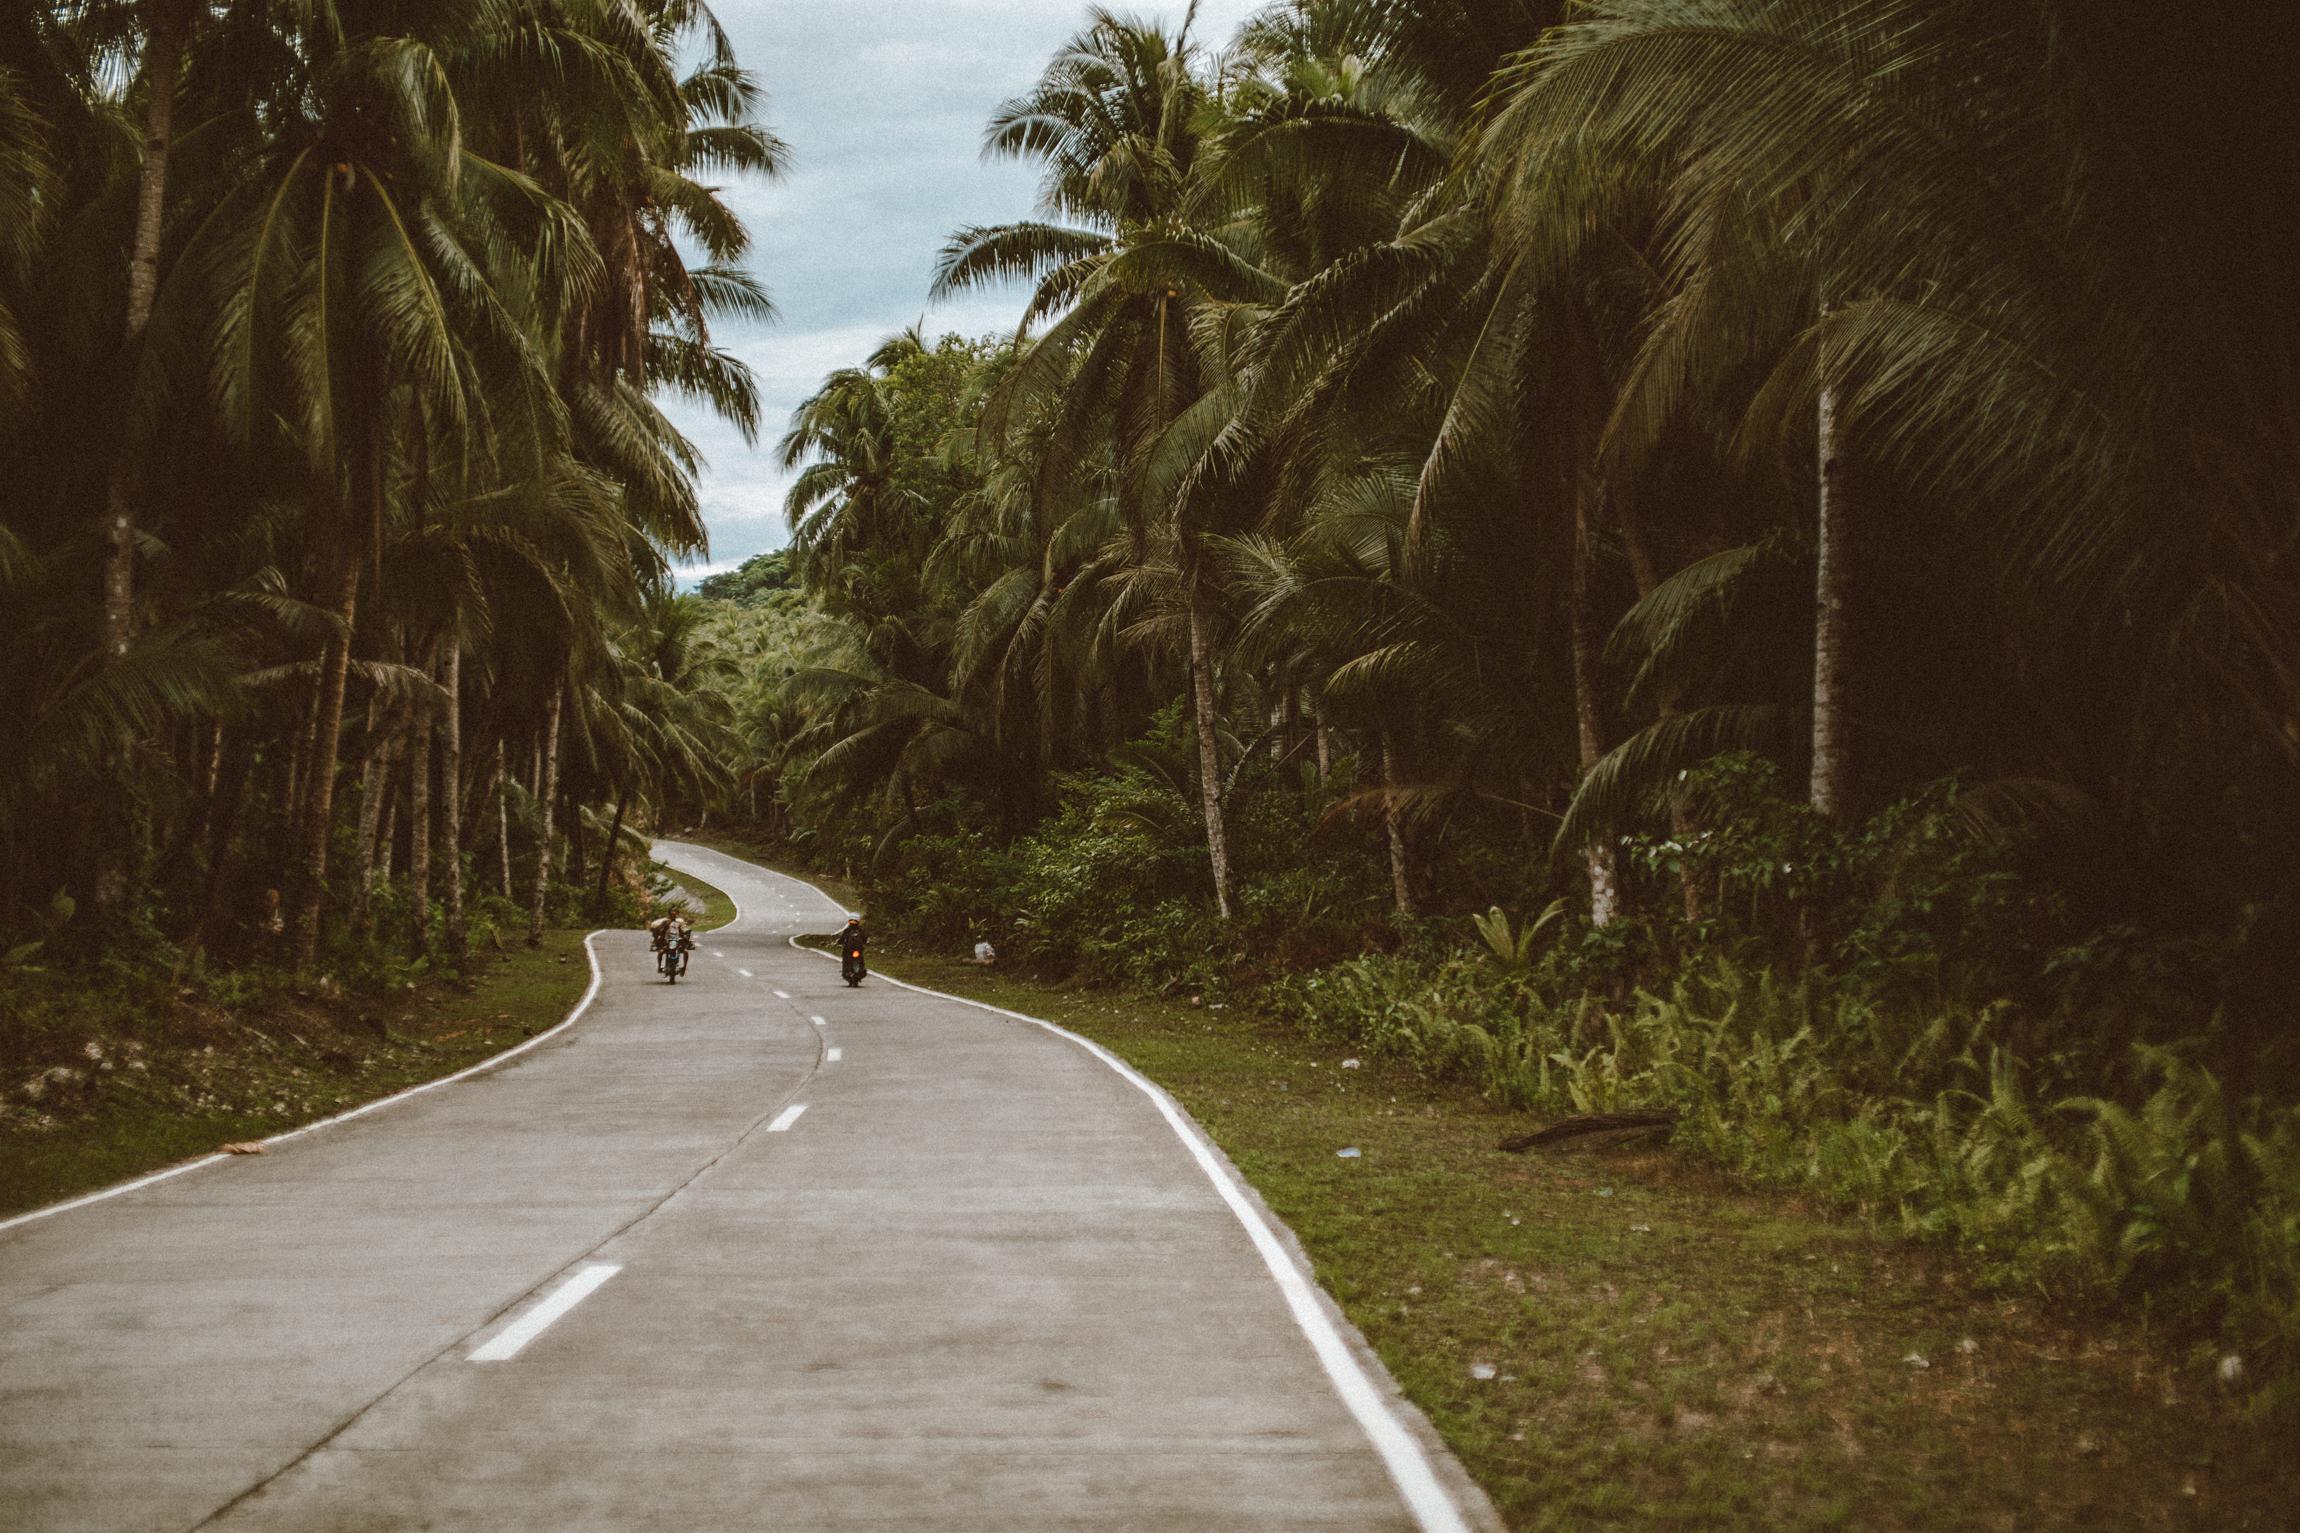 Siargao蜿蜒的道路-椰子树